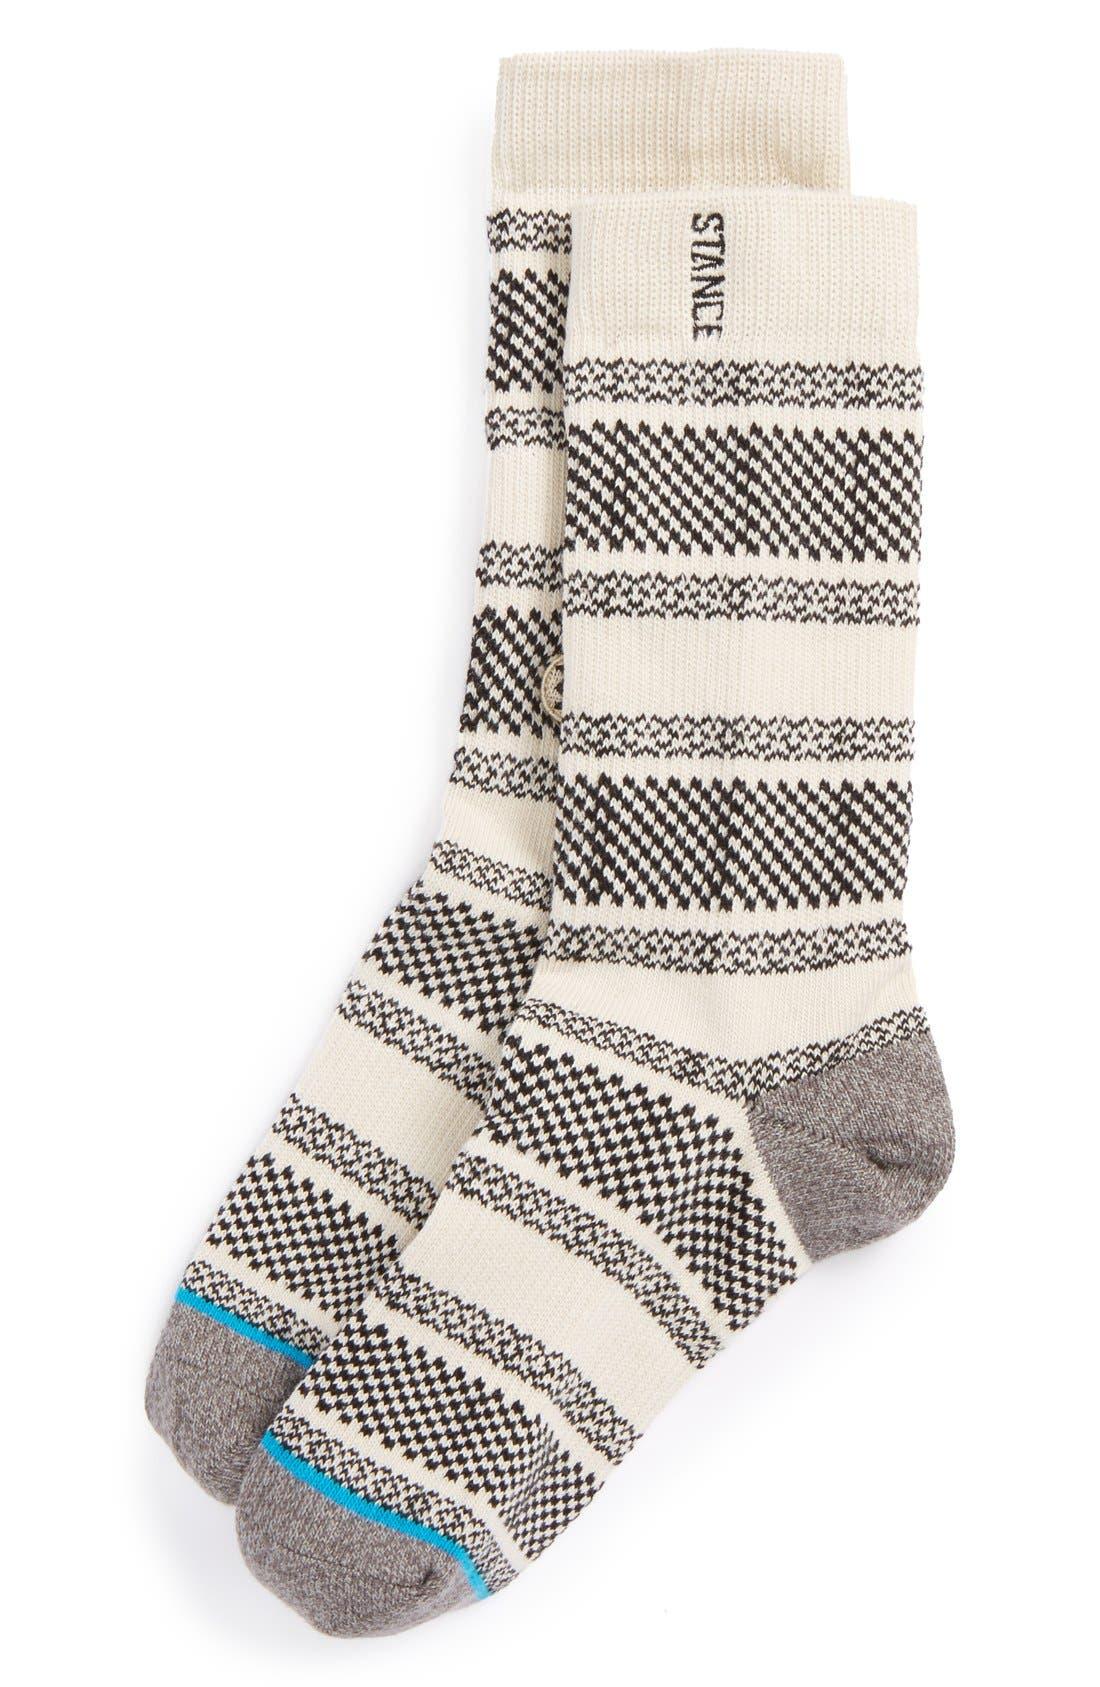 Alternate Image 1 Selected - Stance 'Helen' Socks (Big Kid)